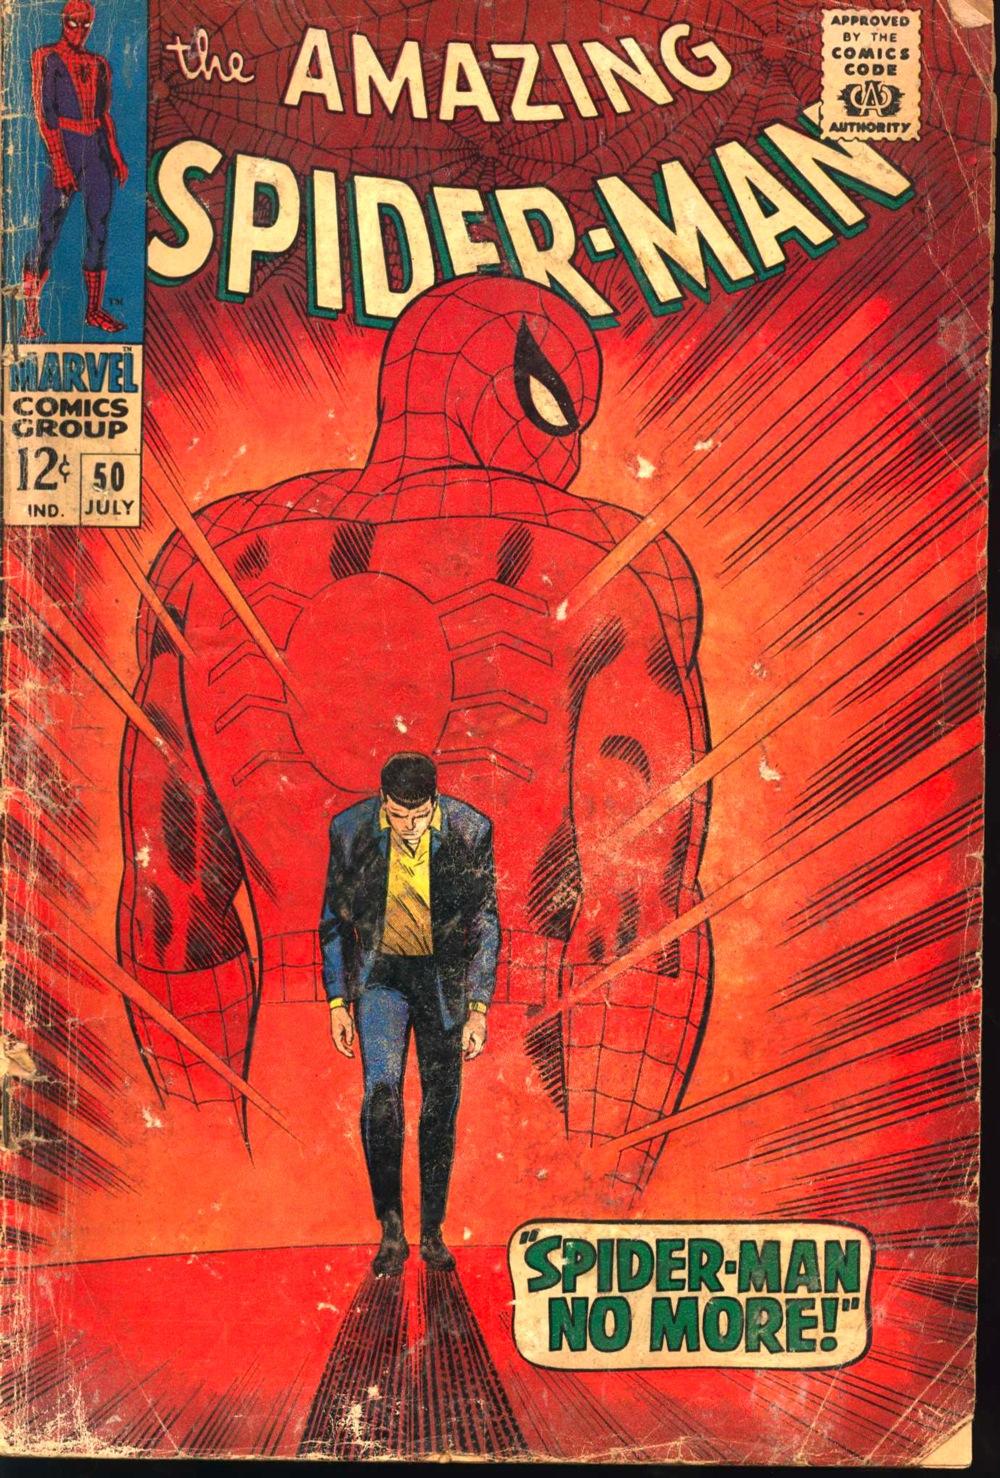 Spider-Man No More